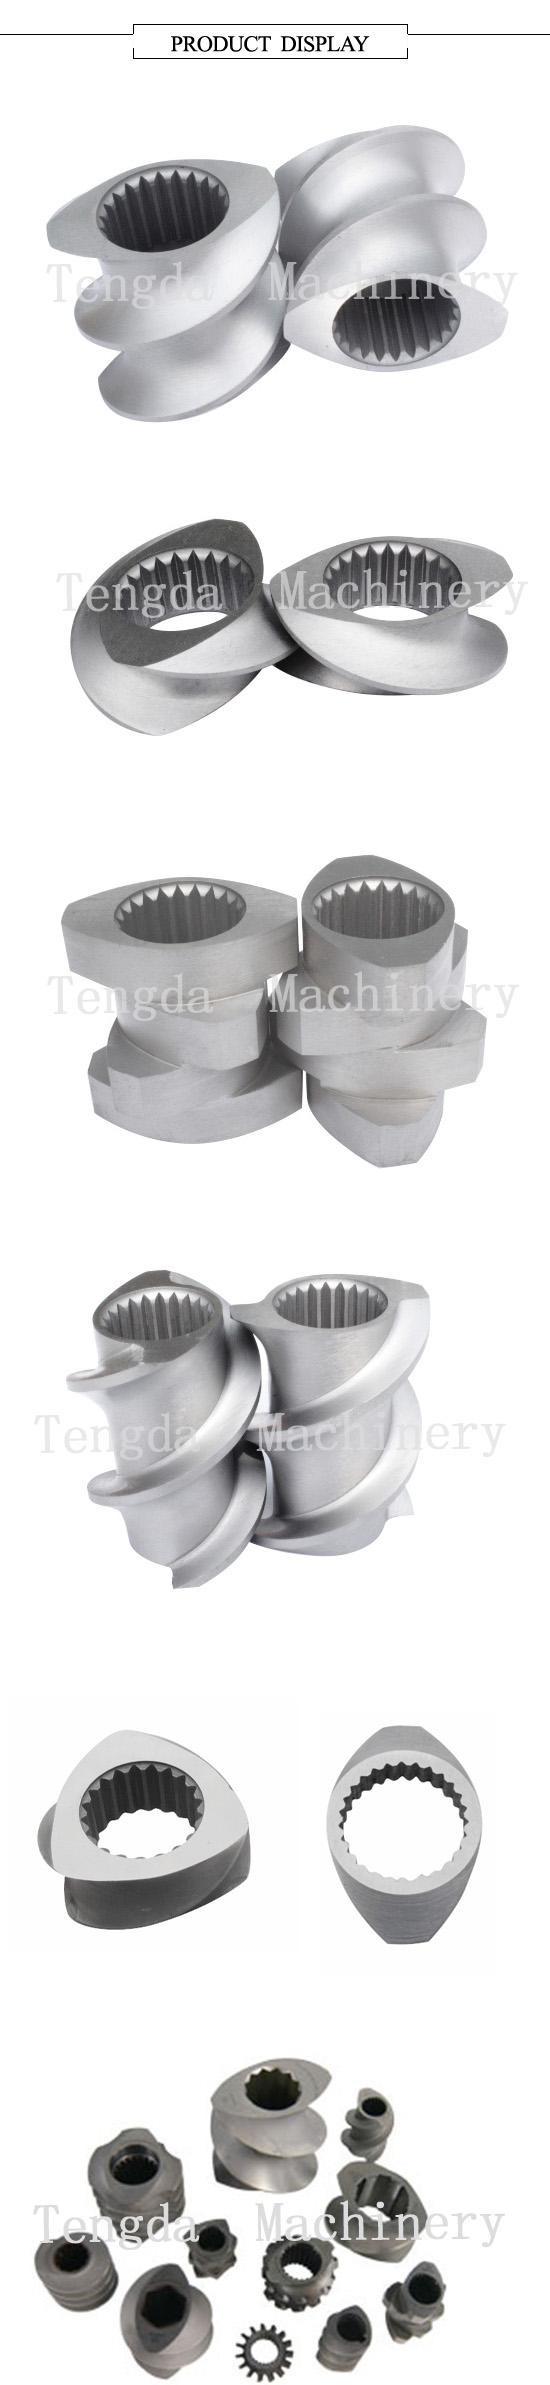 Spare Parts for Tenda Molding Machine